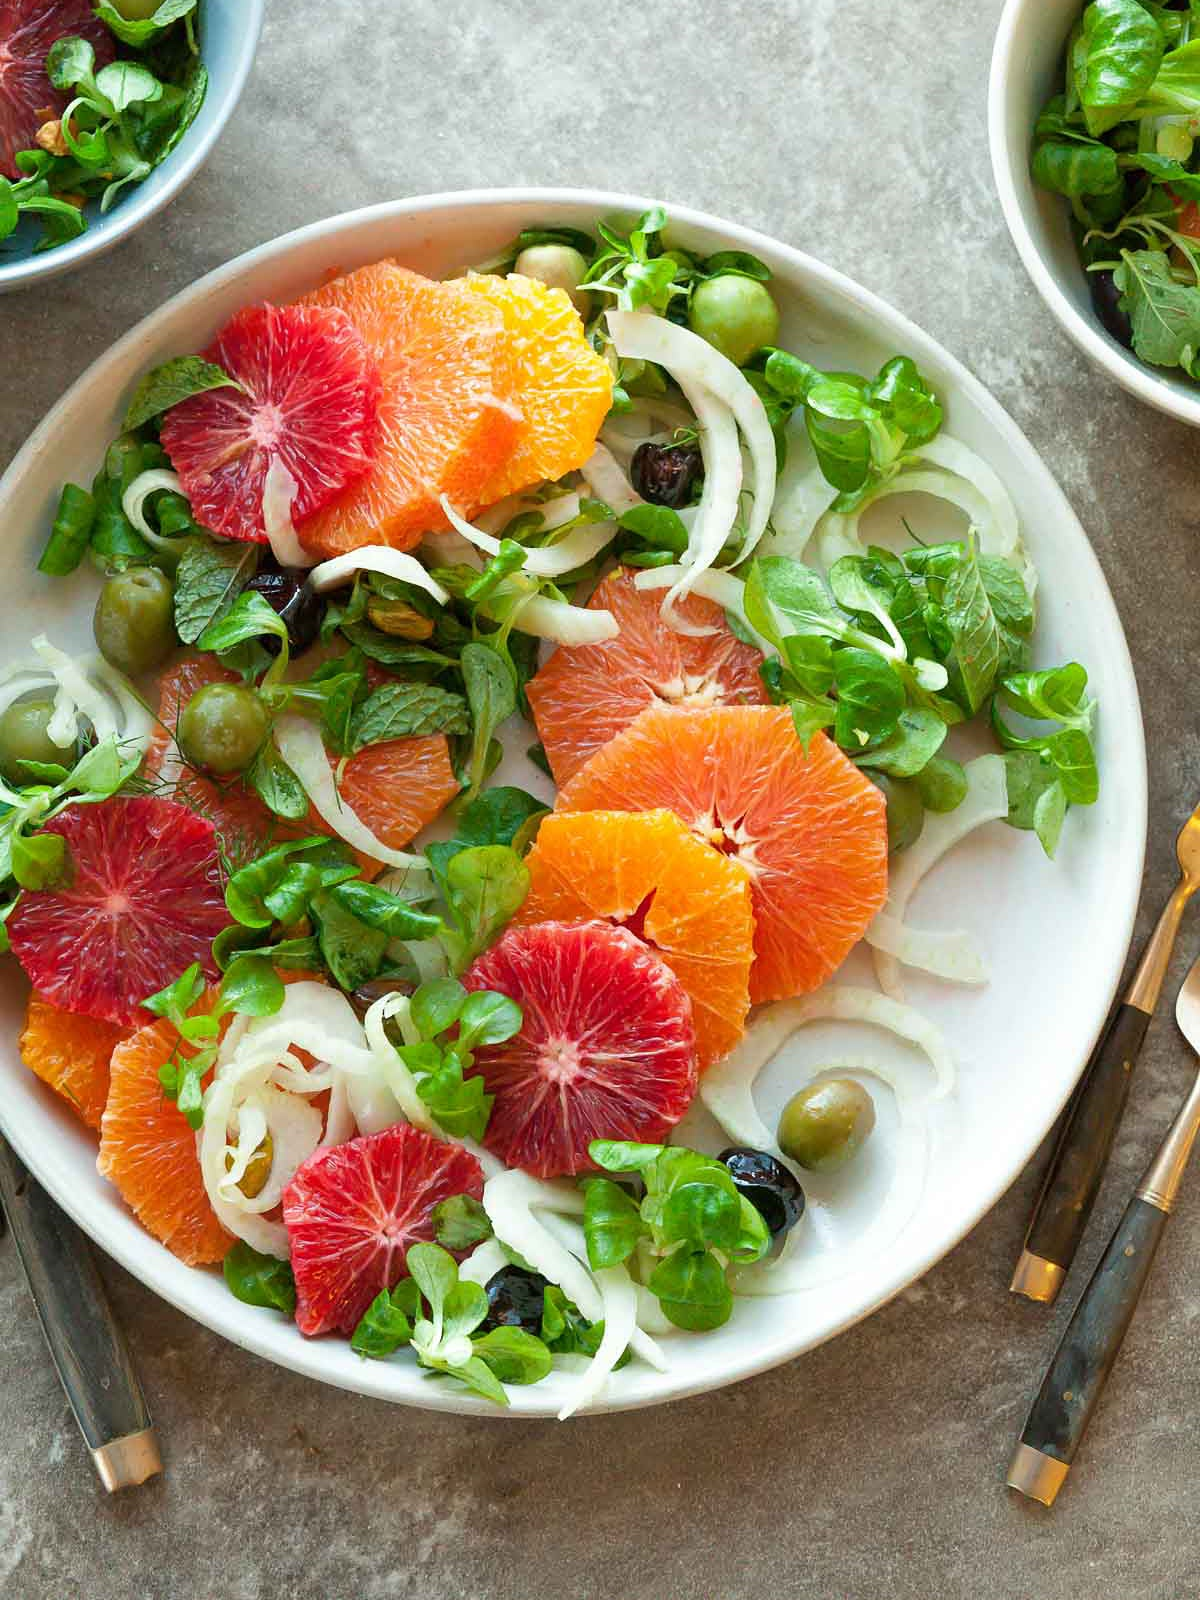 00-FEATURE-winter-salads-domino-orange-olive-fennel